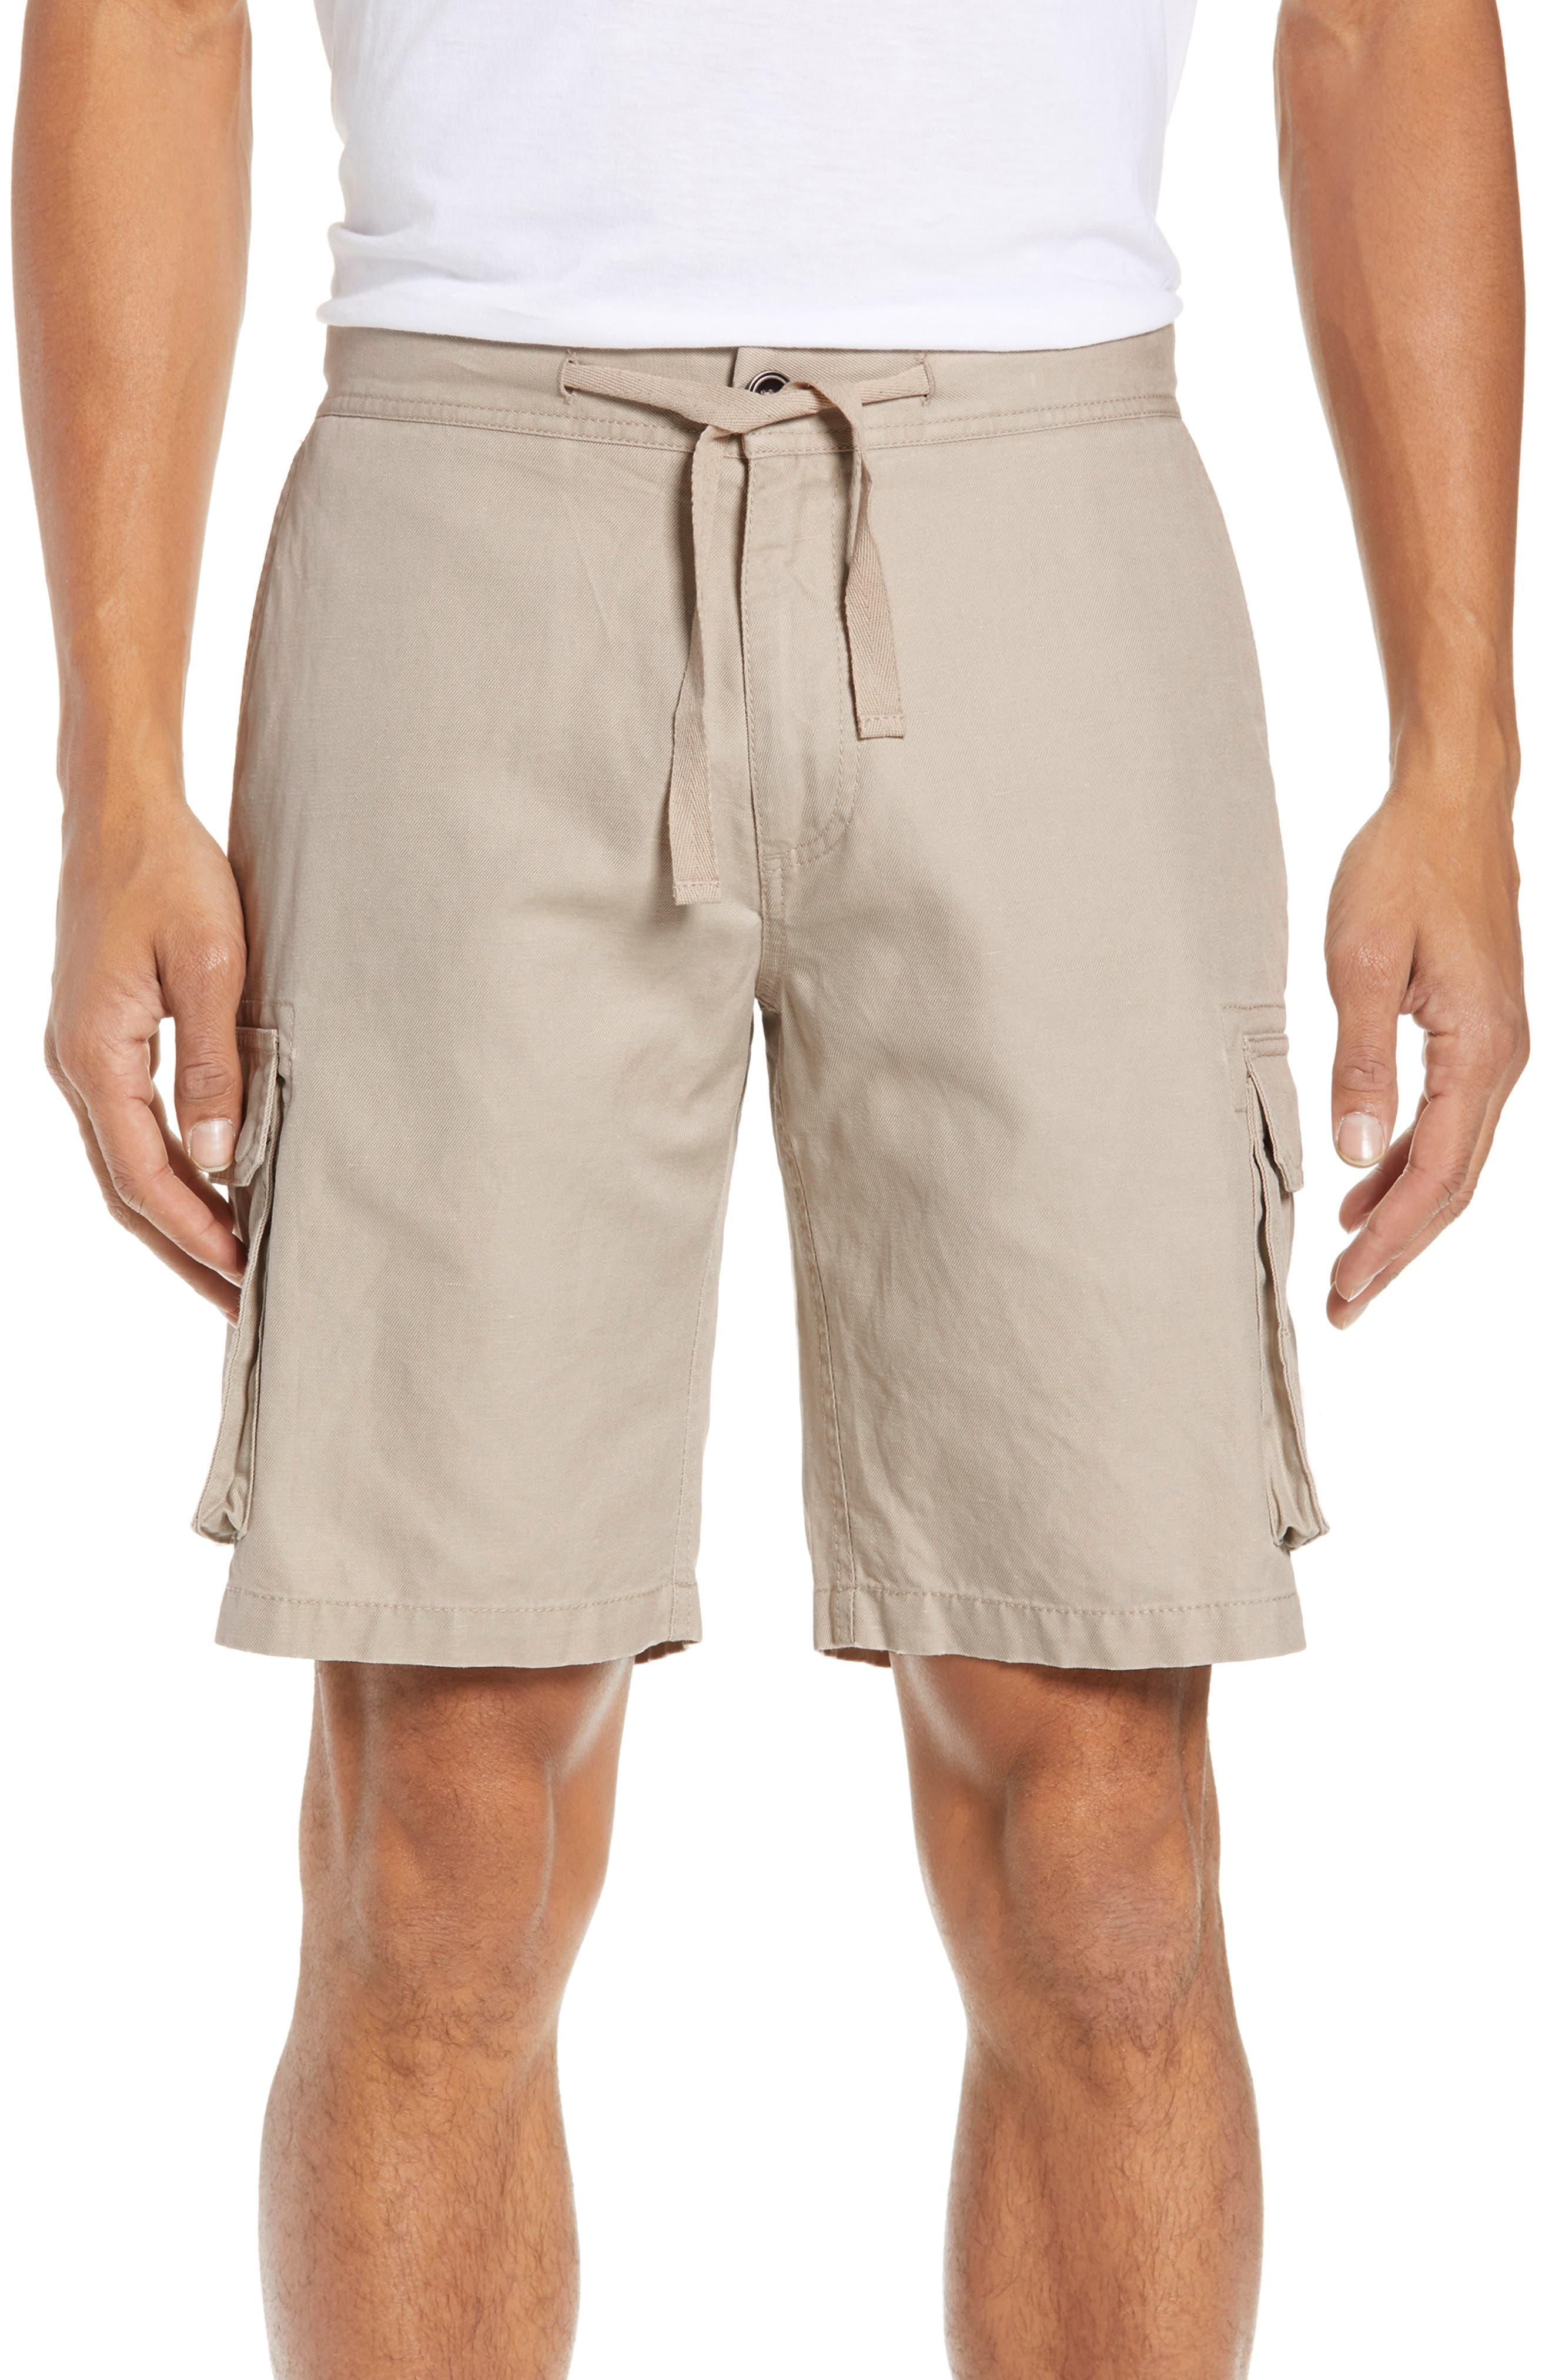 Rodd & Gunn Sandyford Cargo Shorts, White